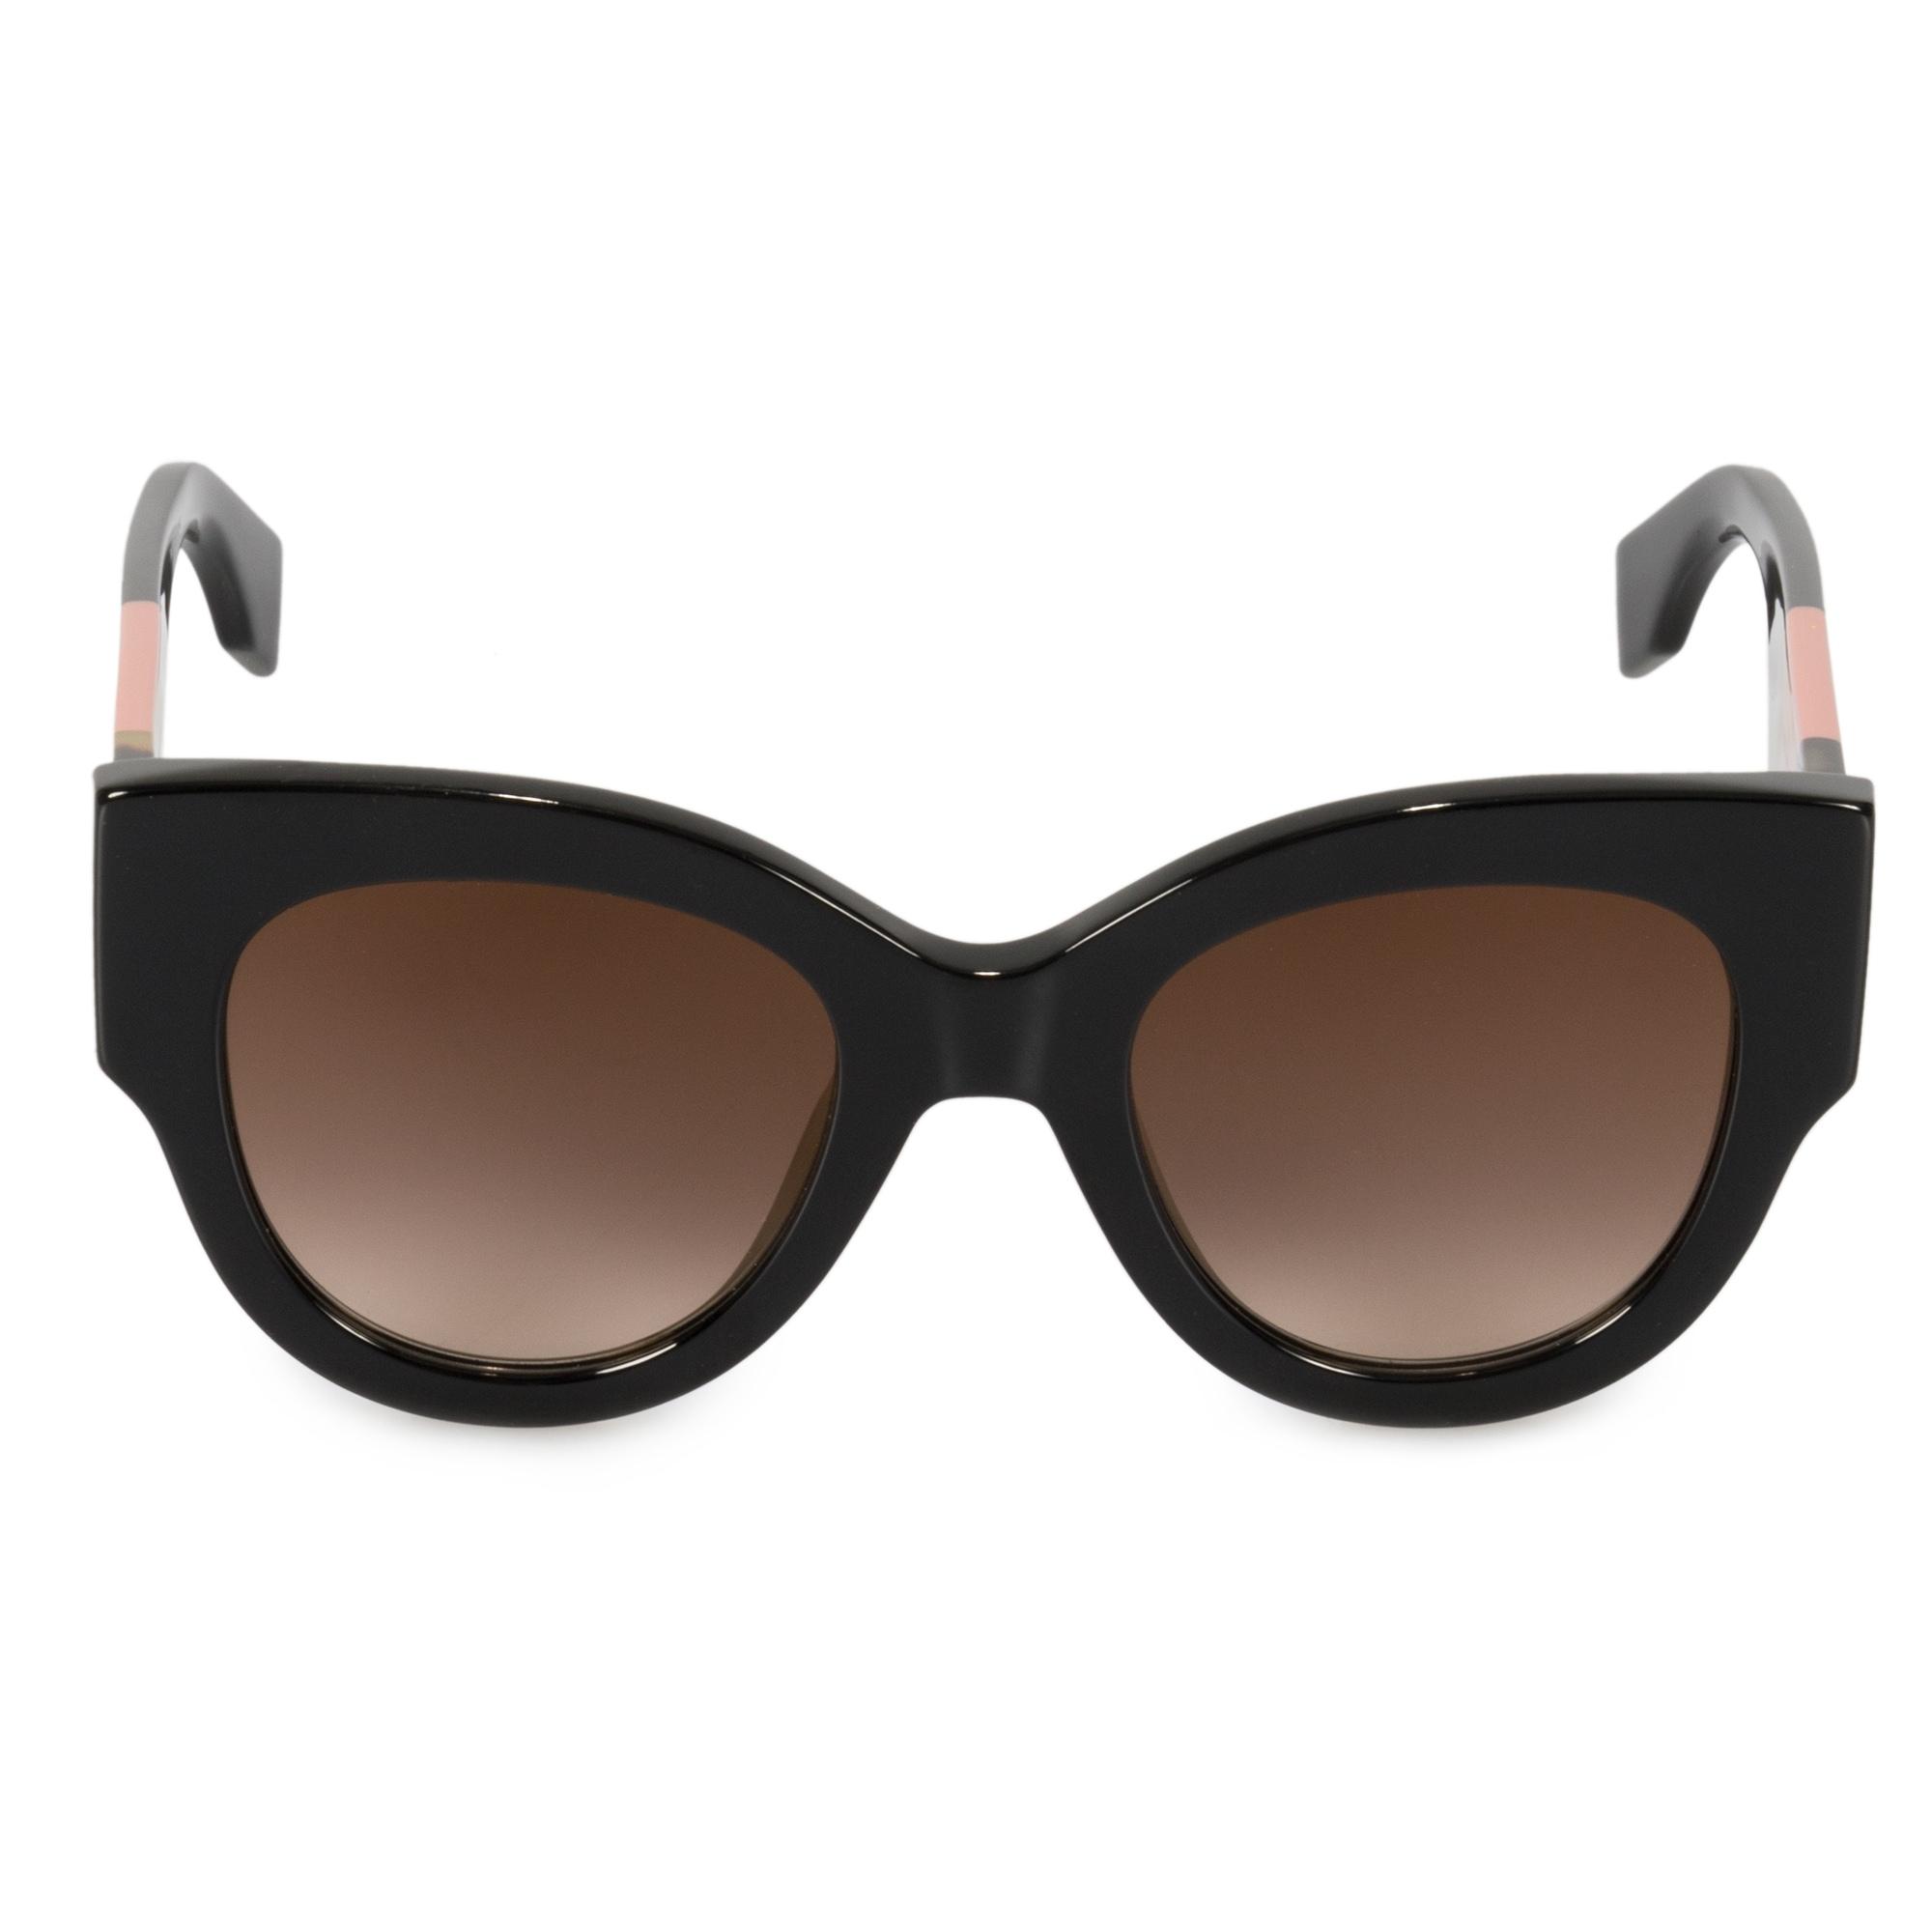 c267231aa931 Cateye Fendi Women s Sunglasses